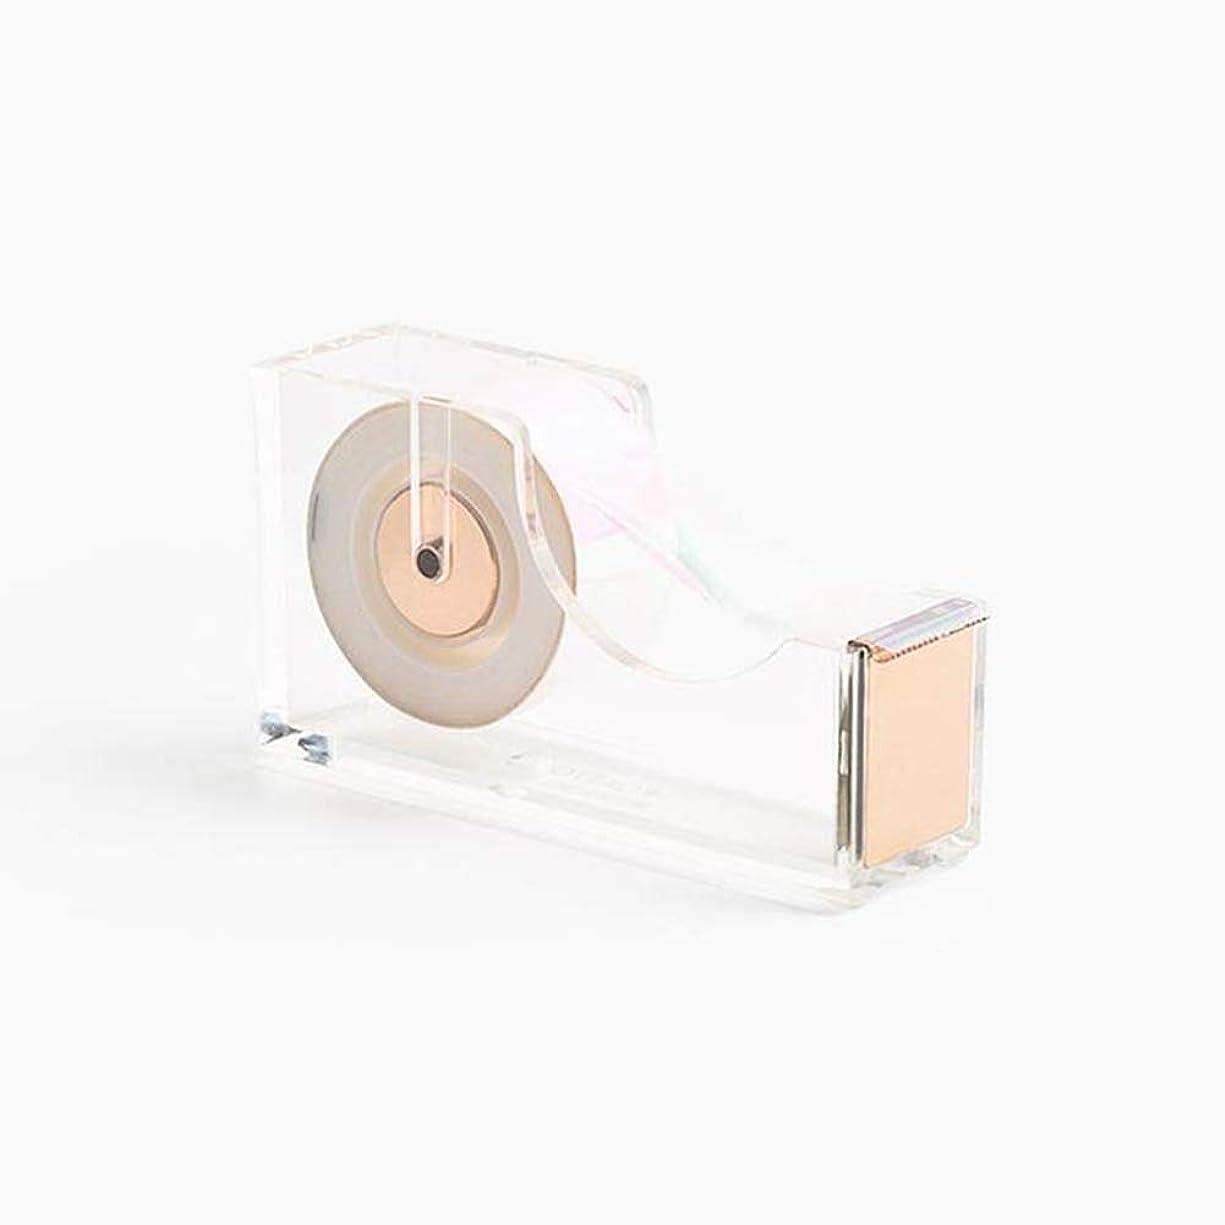 Acrylic/Lucite & Gold Tape Dispenser